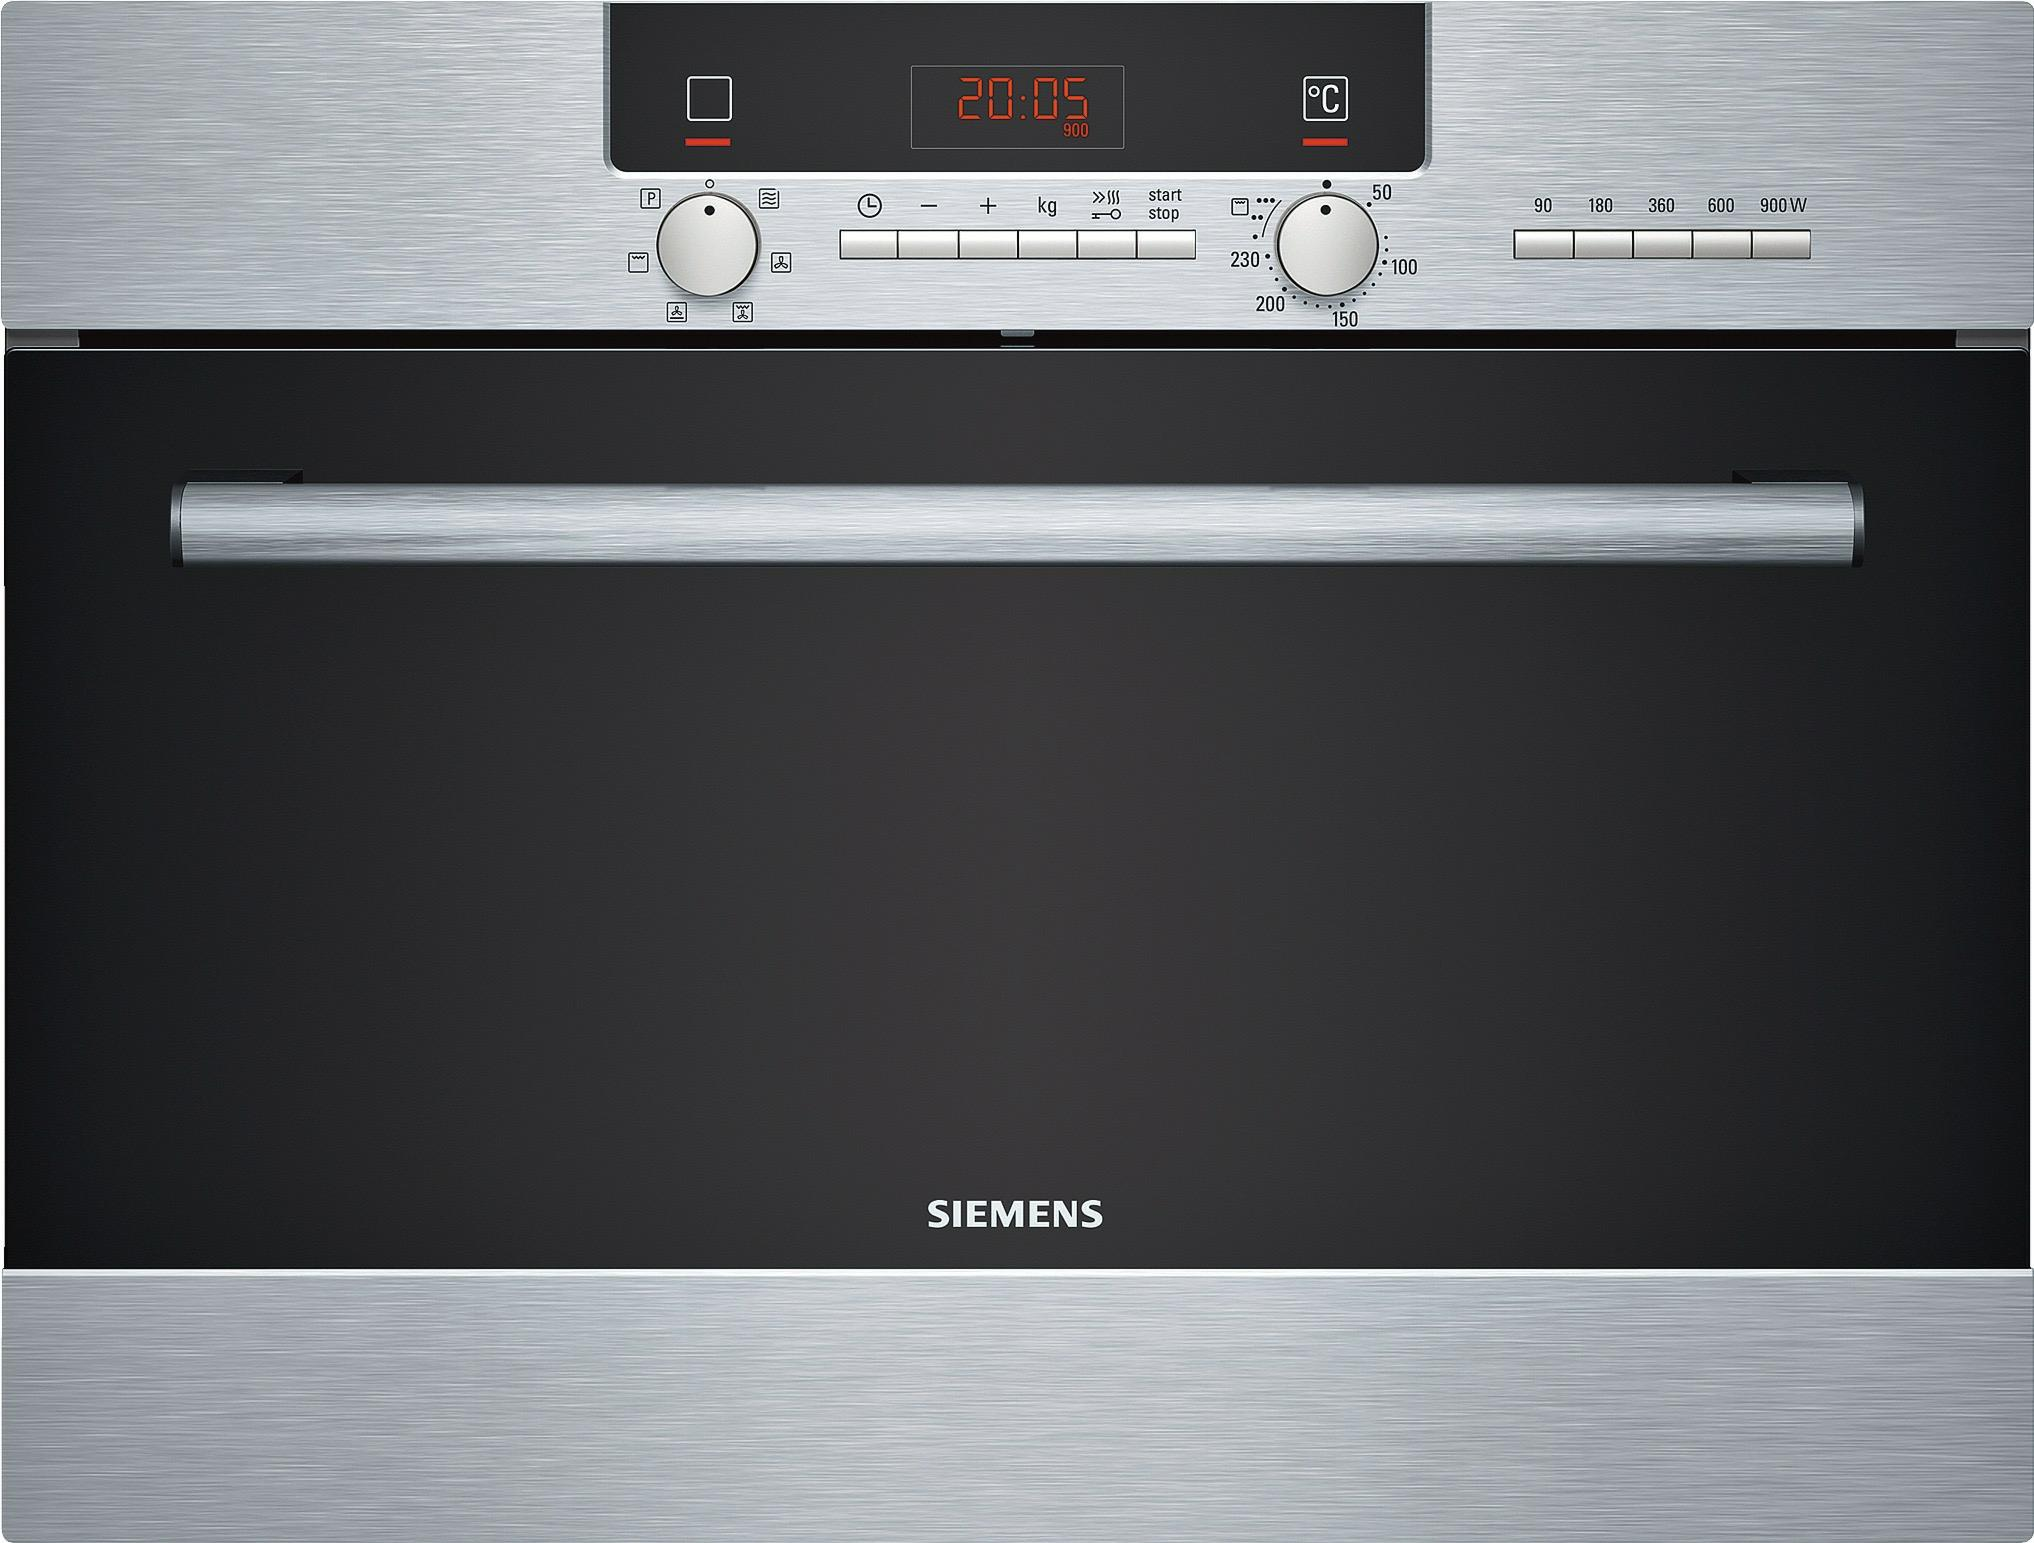 microgolfoven Siemens Promotoren HB84H500 microgolfoven combi HB 84H500 HB 84 H 500